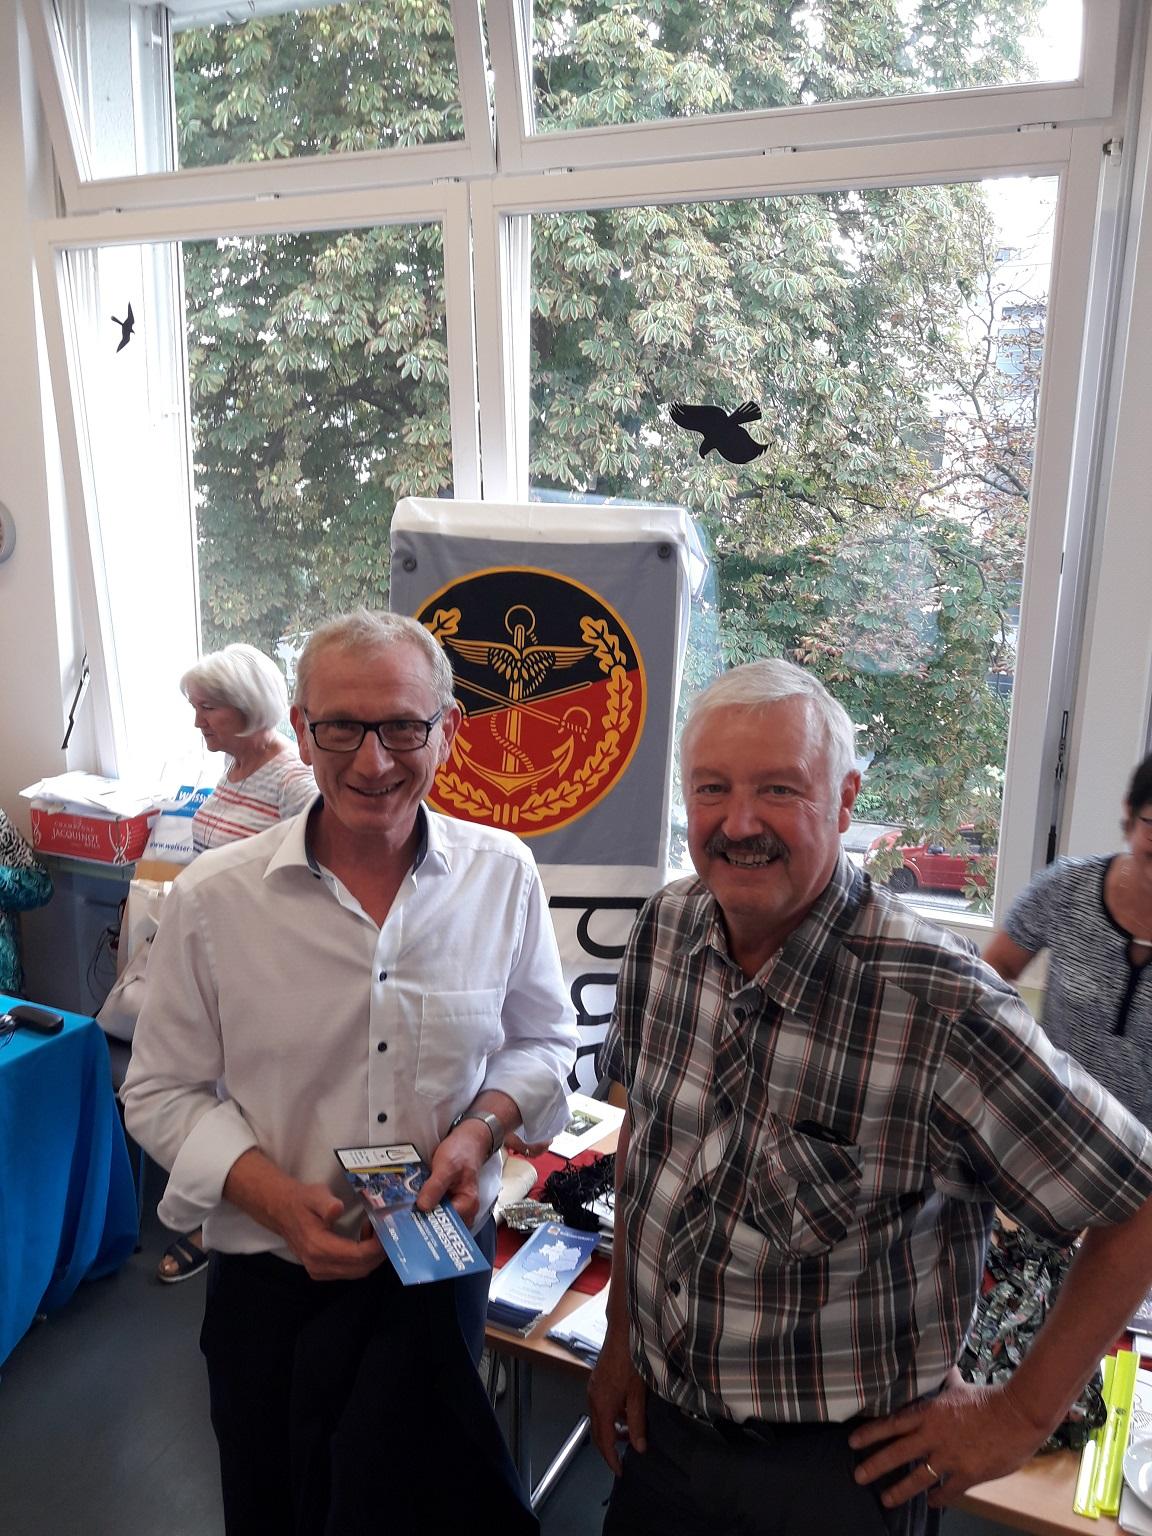 KERH Kreis Ahrweiler gratuliert zu 20 Jahre Forum Altenarbeit